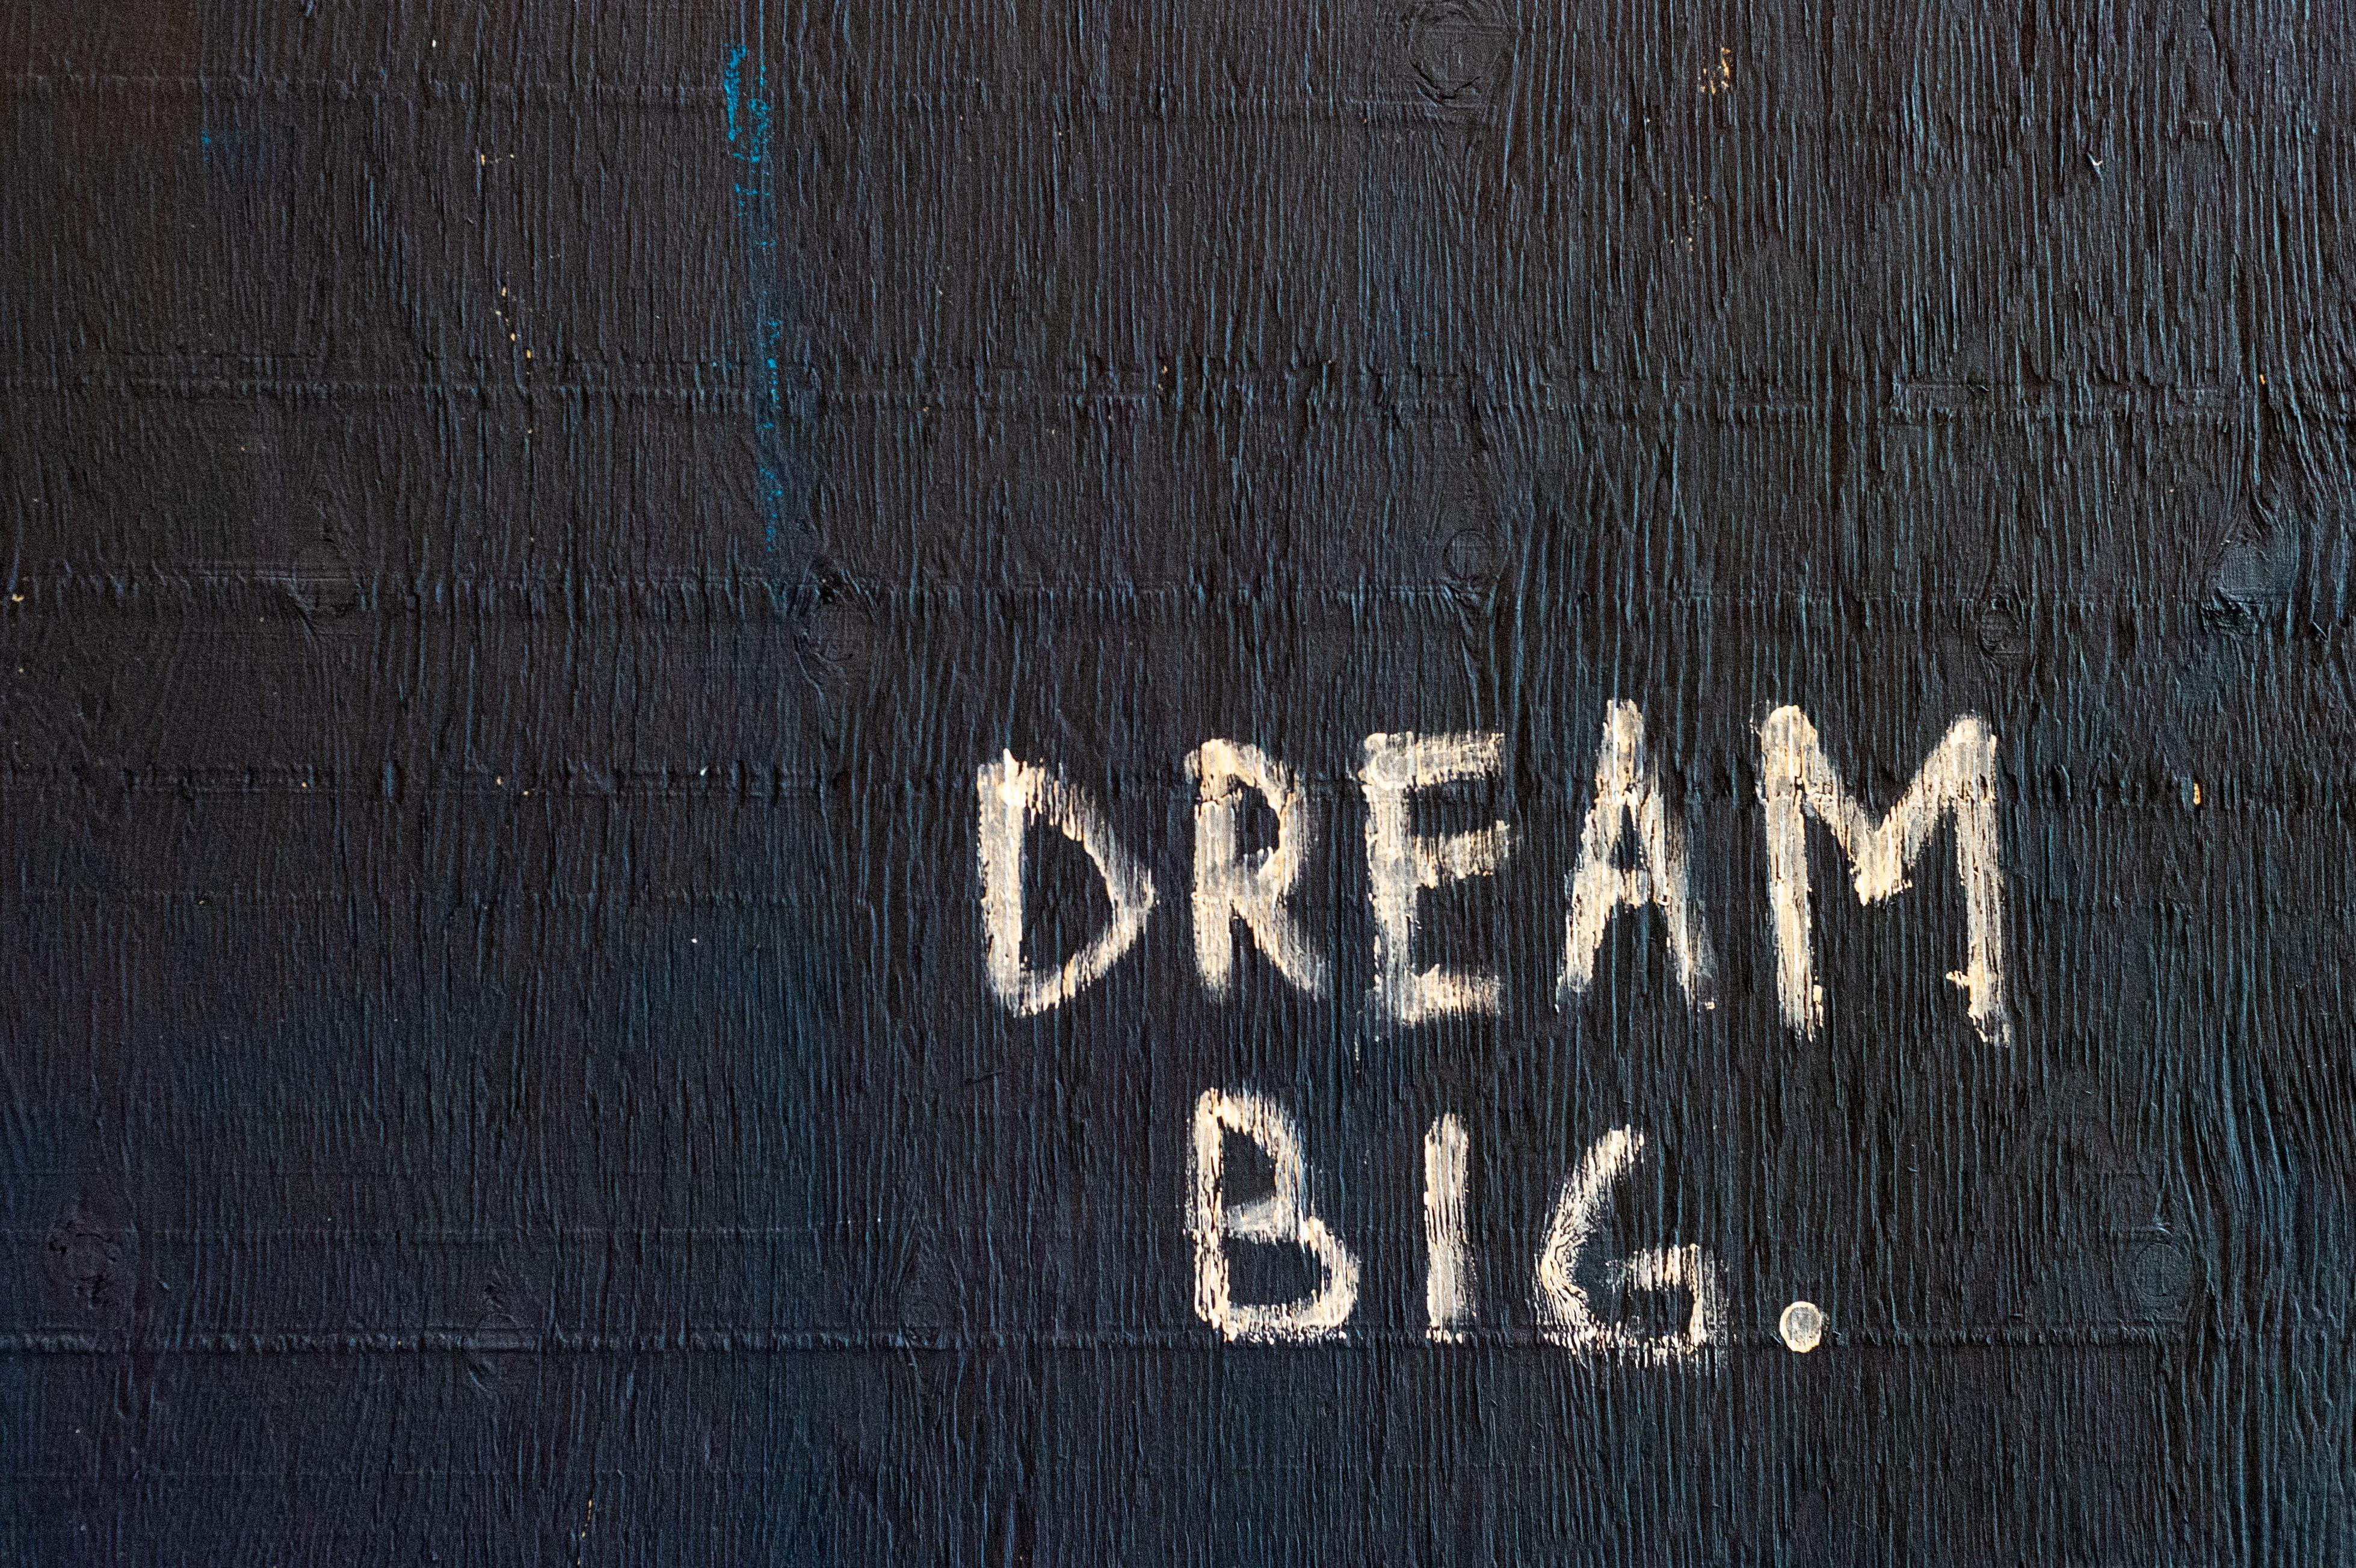 dream pictures images on unsplash